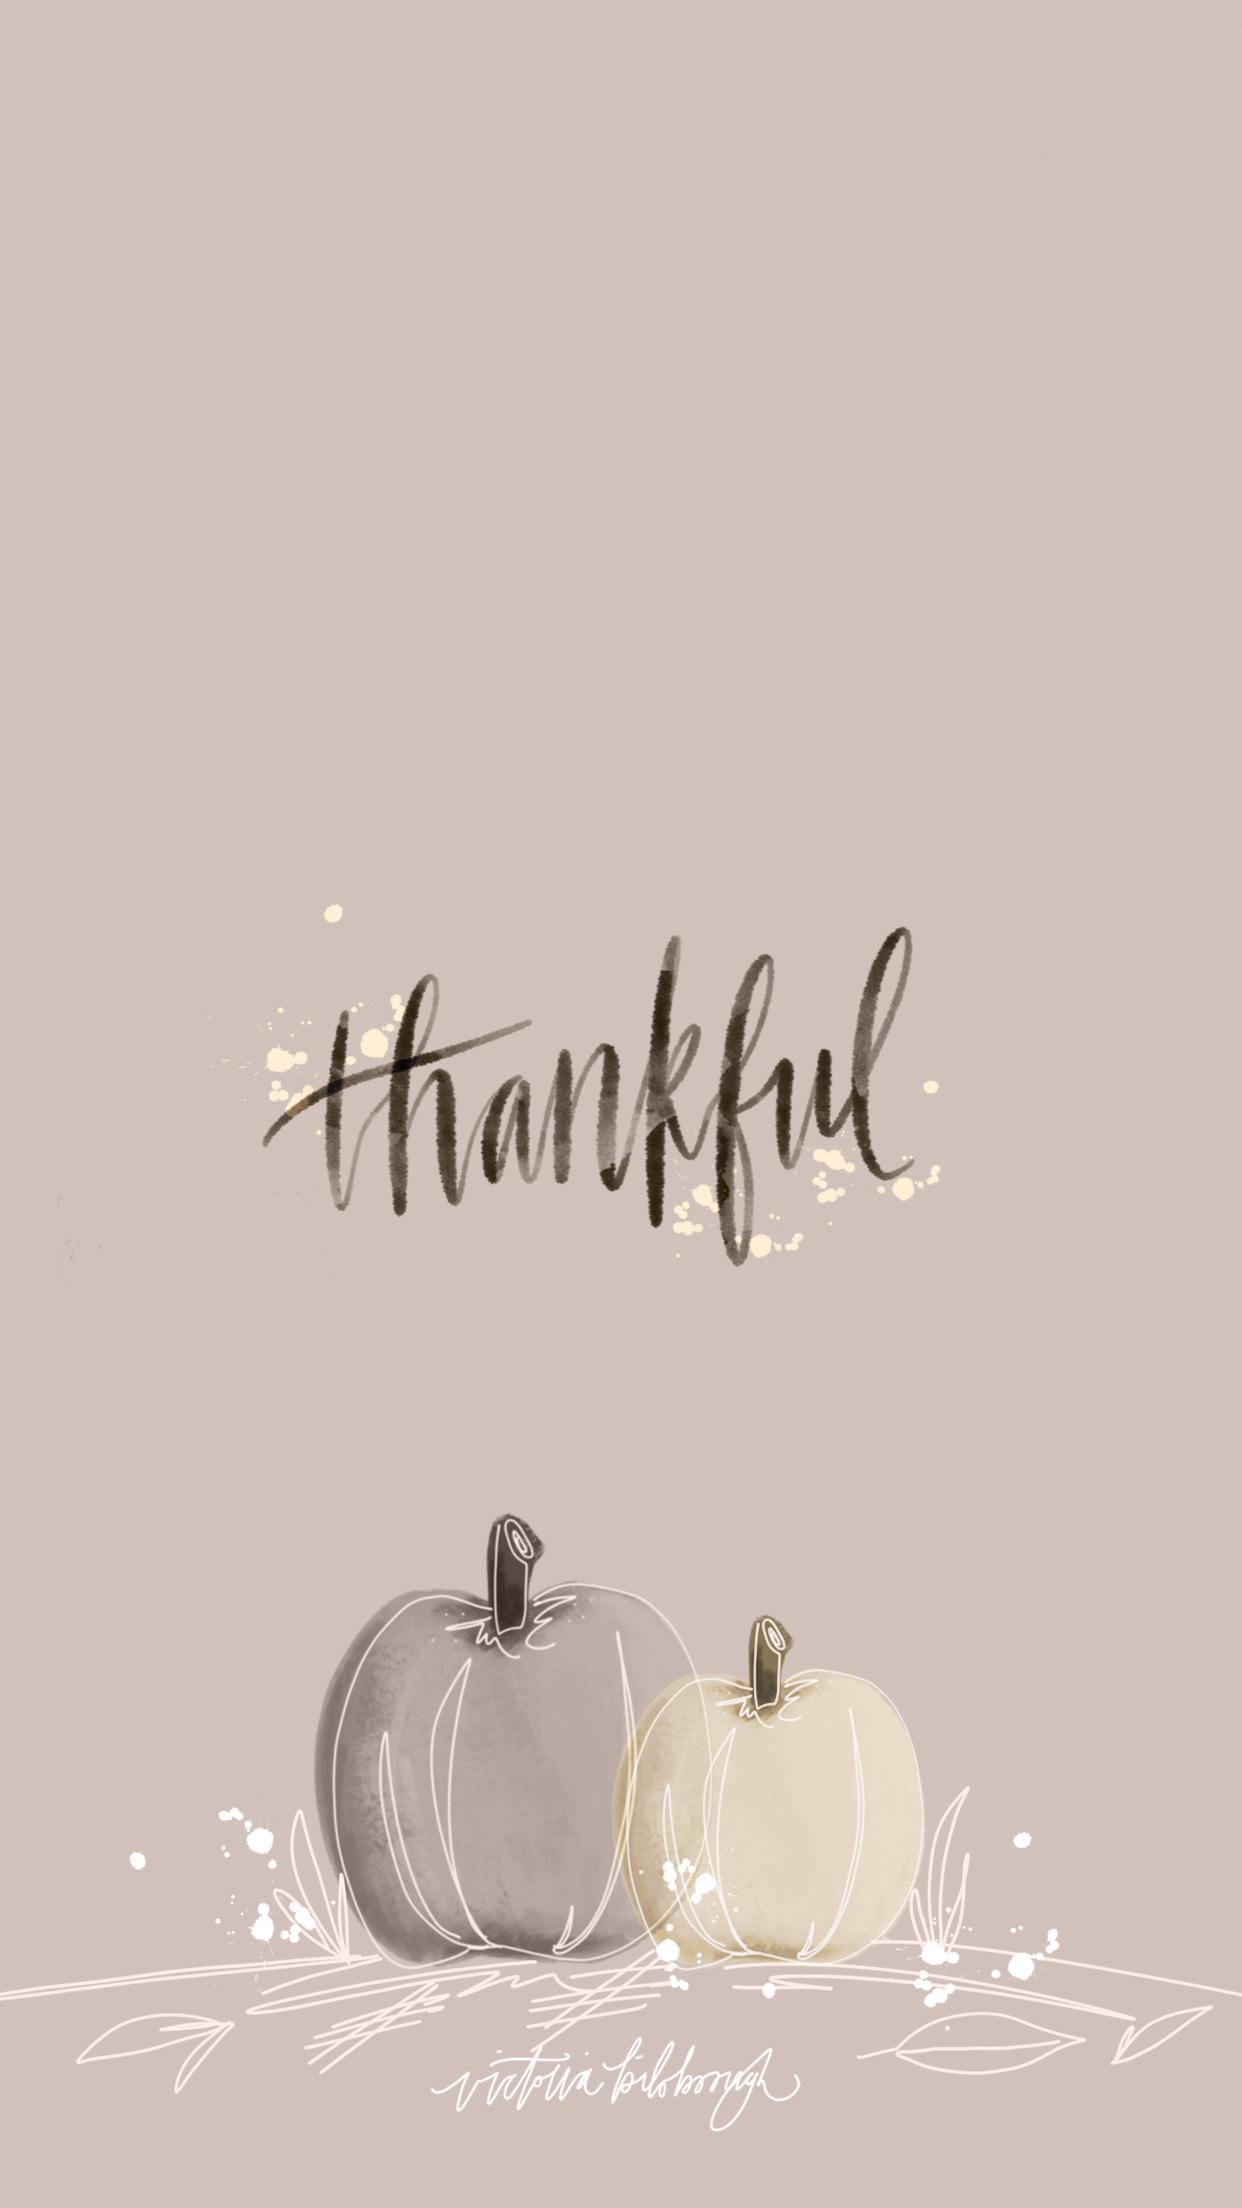 November + Thanksgiving Wallpapers | victoriabilsborough.com